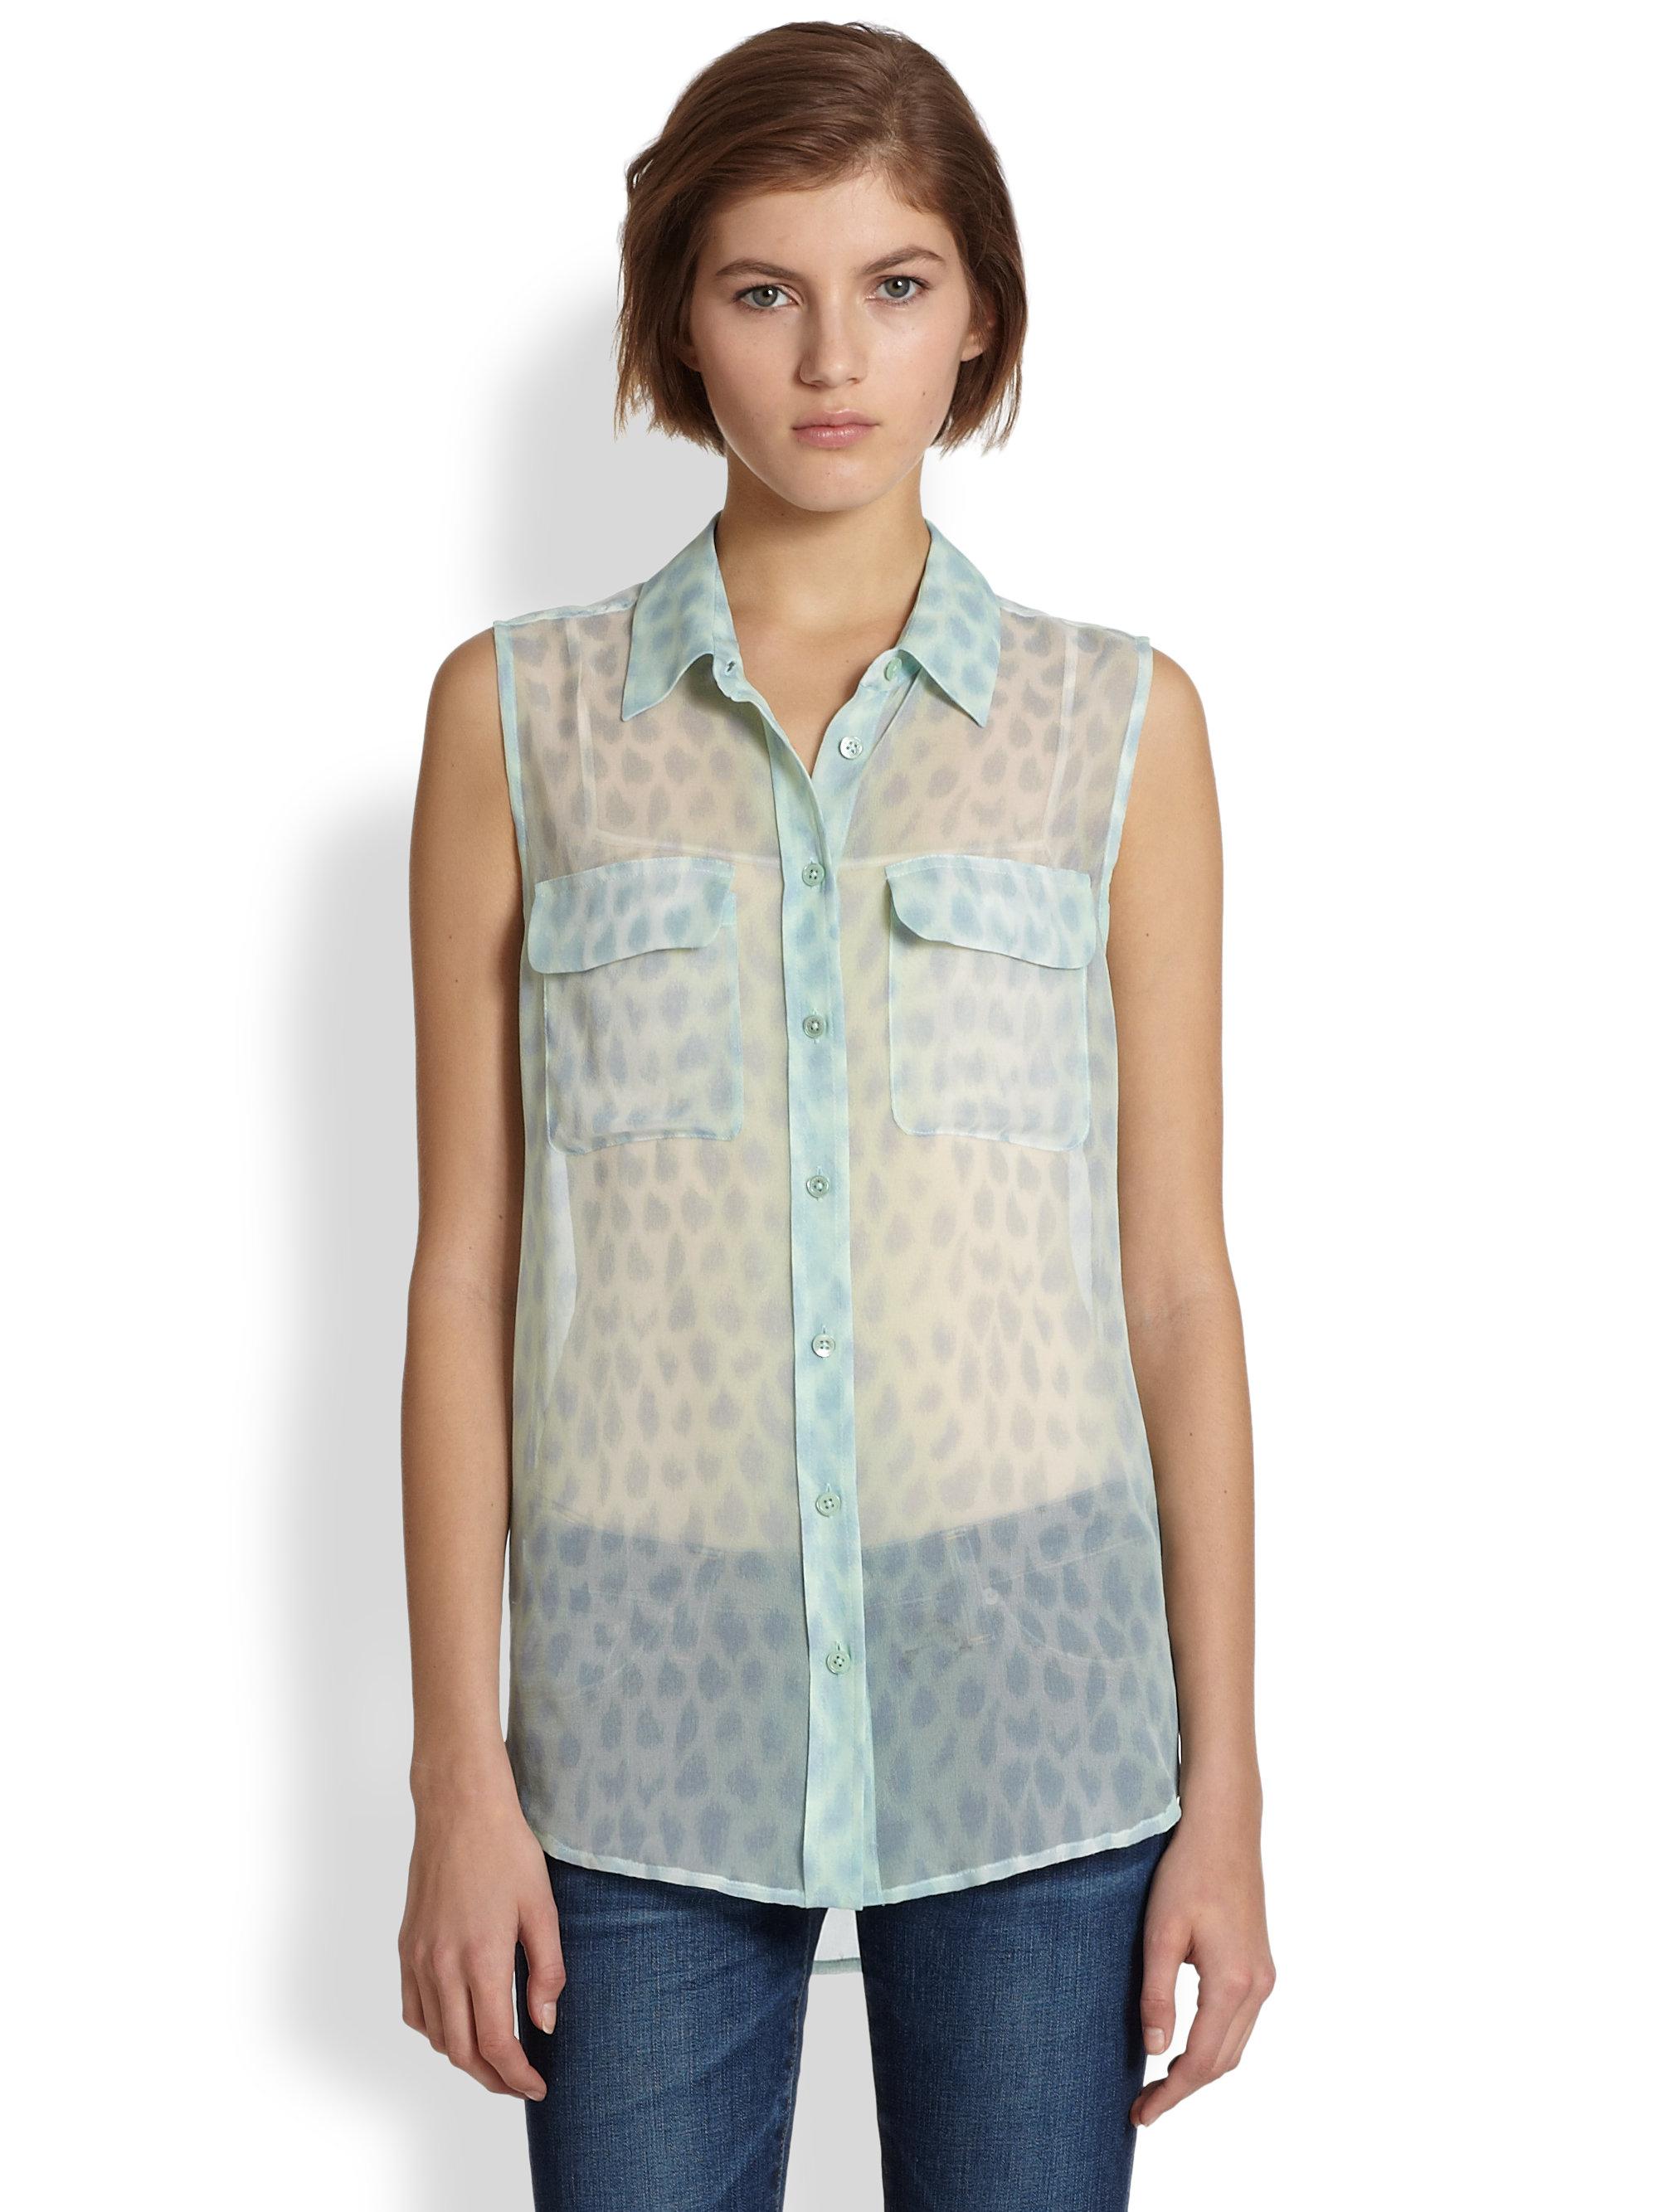 346a74903070f Lyst - Equipment Slim Signature Silk Leopard-Print Sleeveless Shirt ...